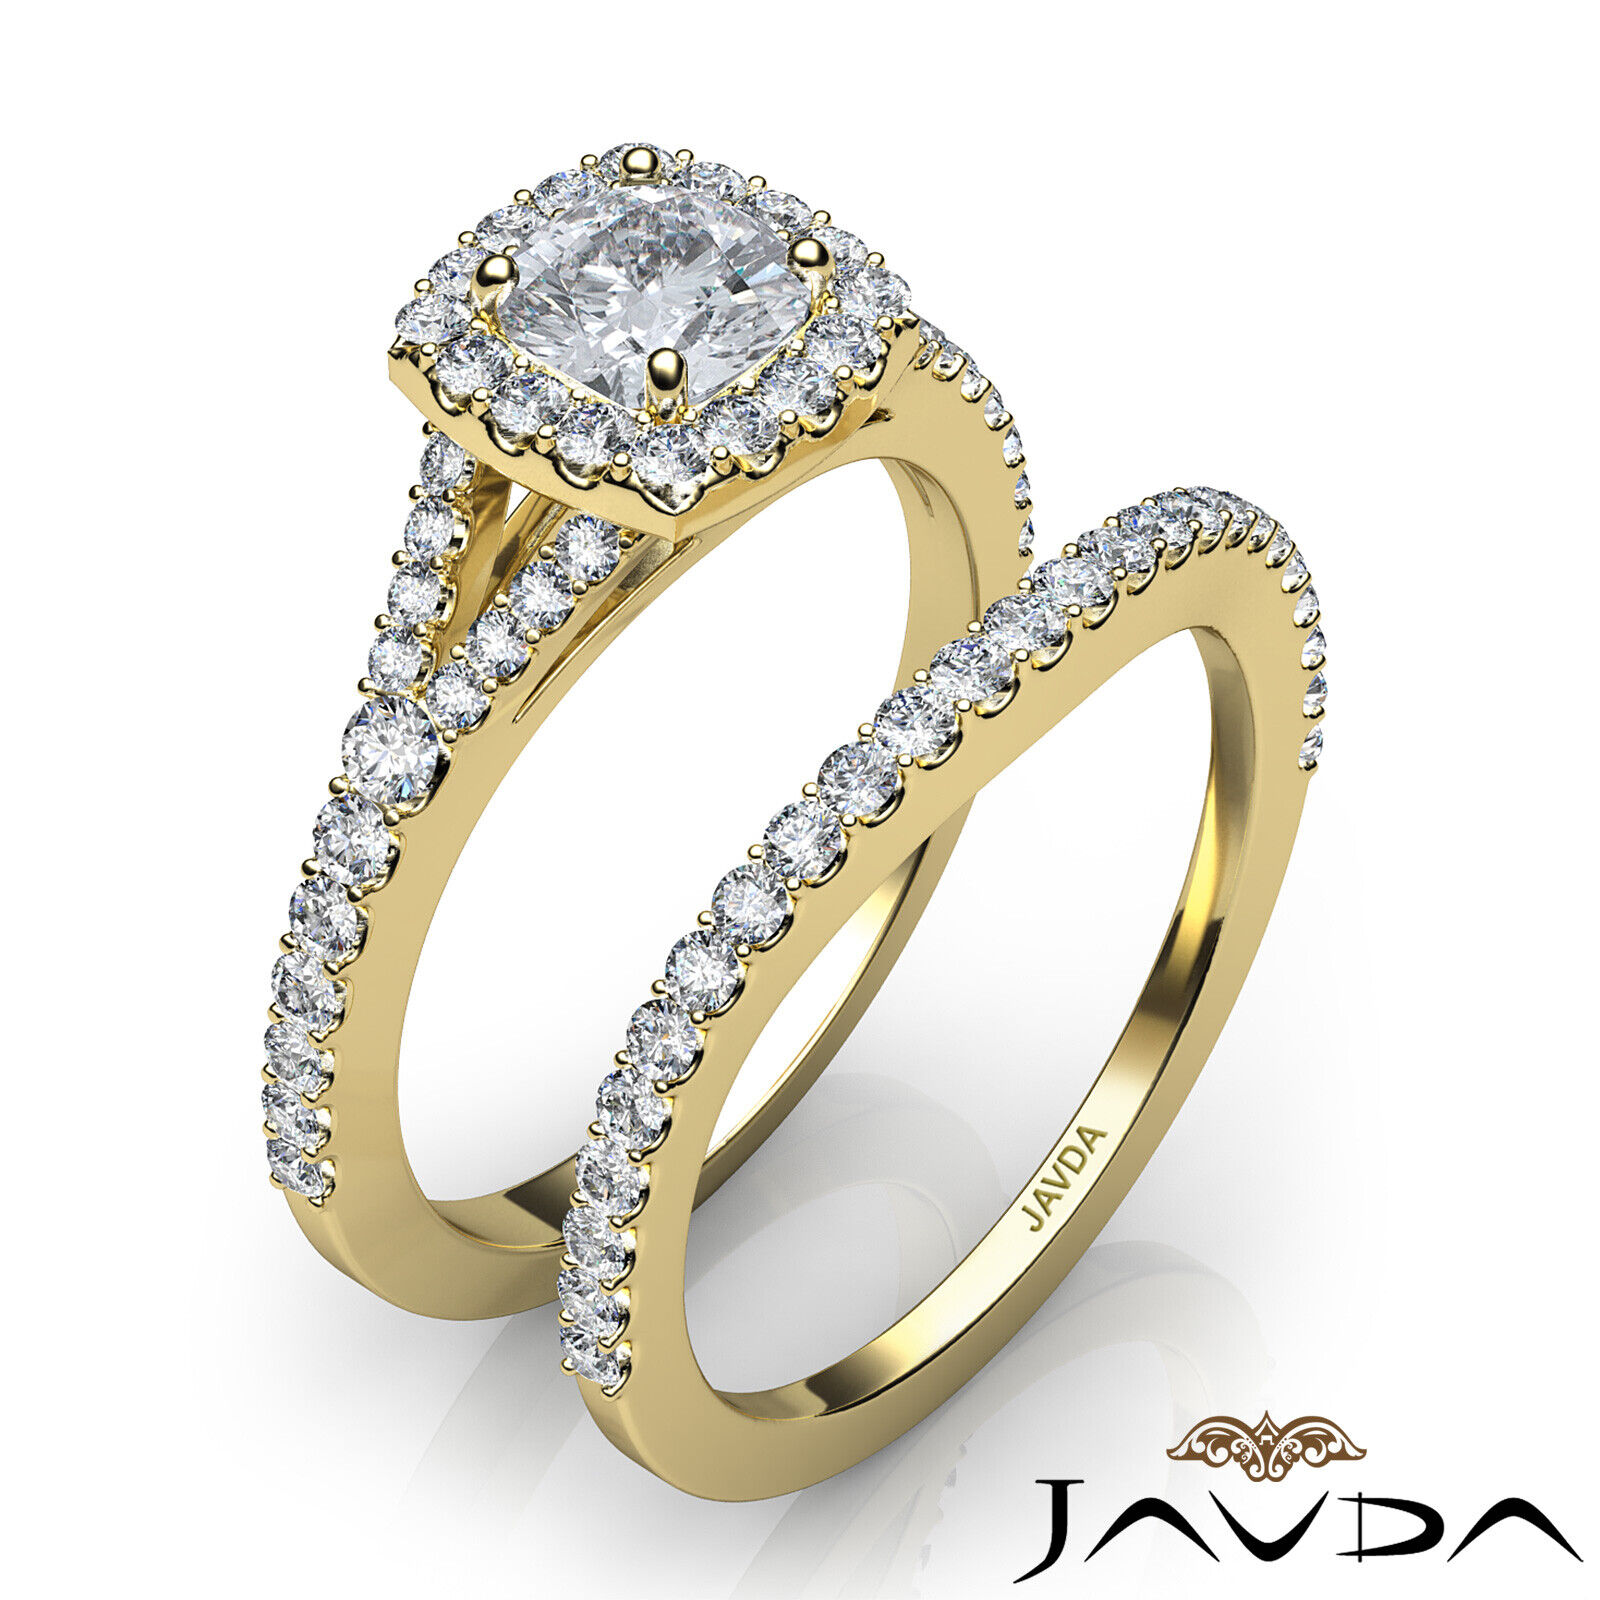 1.5ctw U Cut Pave Halo Bridal Cushion Diamond Engagement Ring GIA F-VS2 W Gold 11